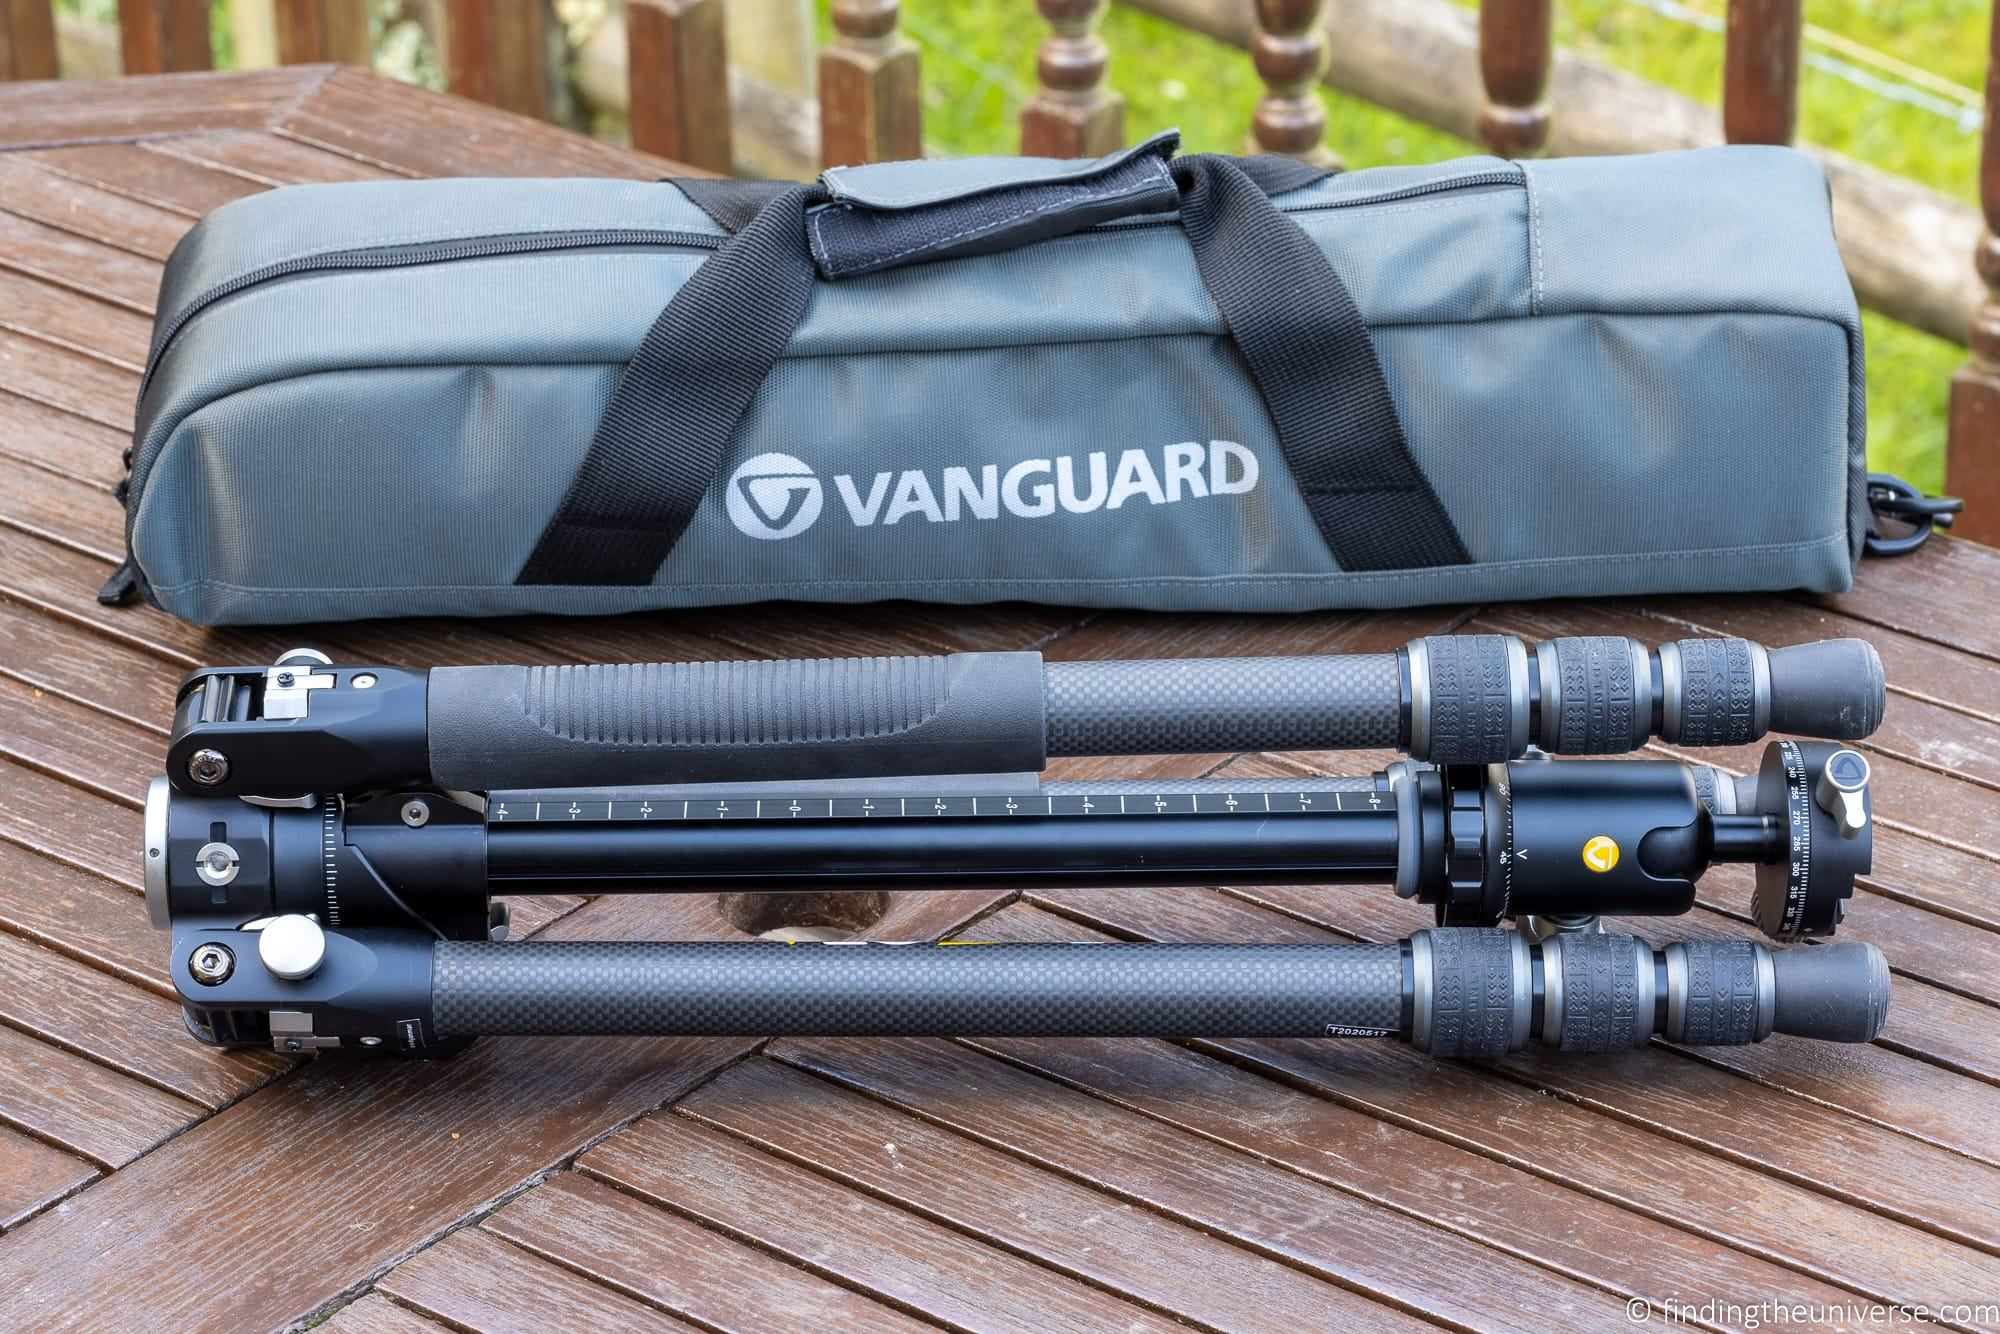 Vanguard VEO 3T+ 264CB Travel Tripod Review